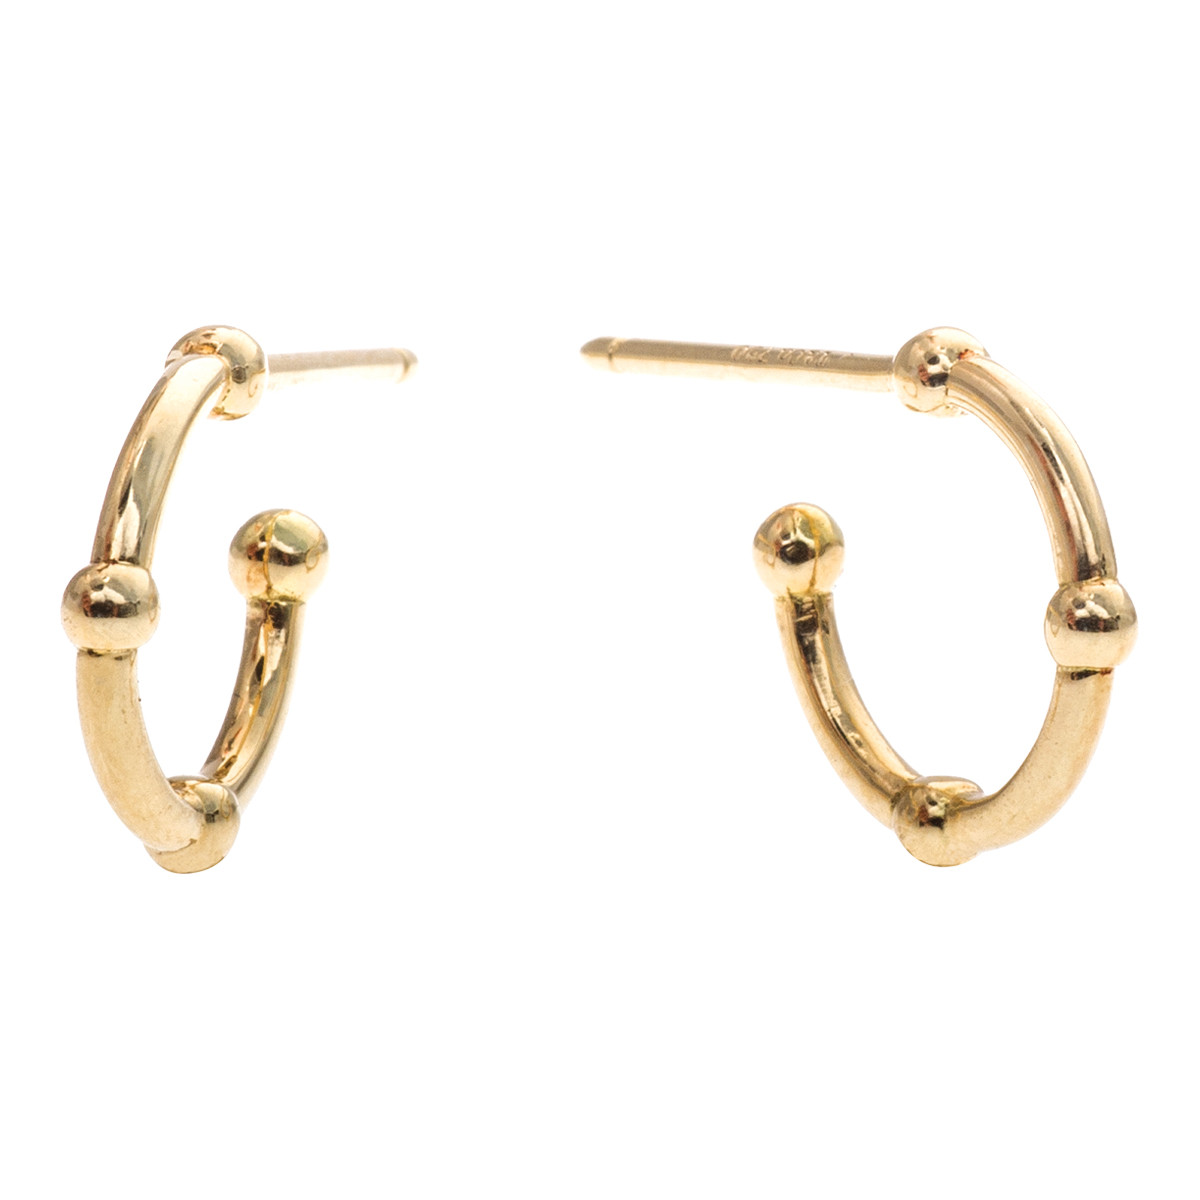 Vintage Tiffany & Co. Small Hoop Earrings